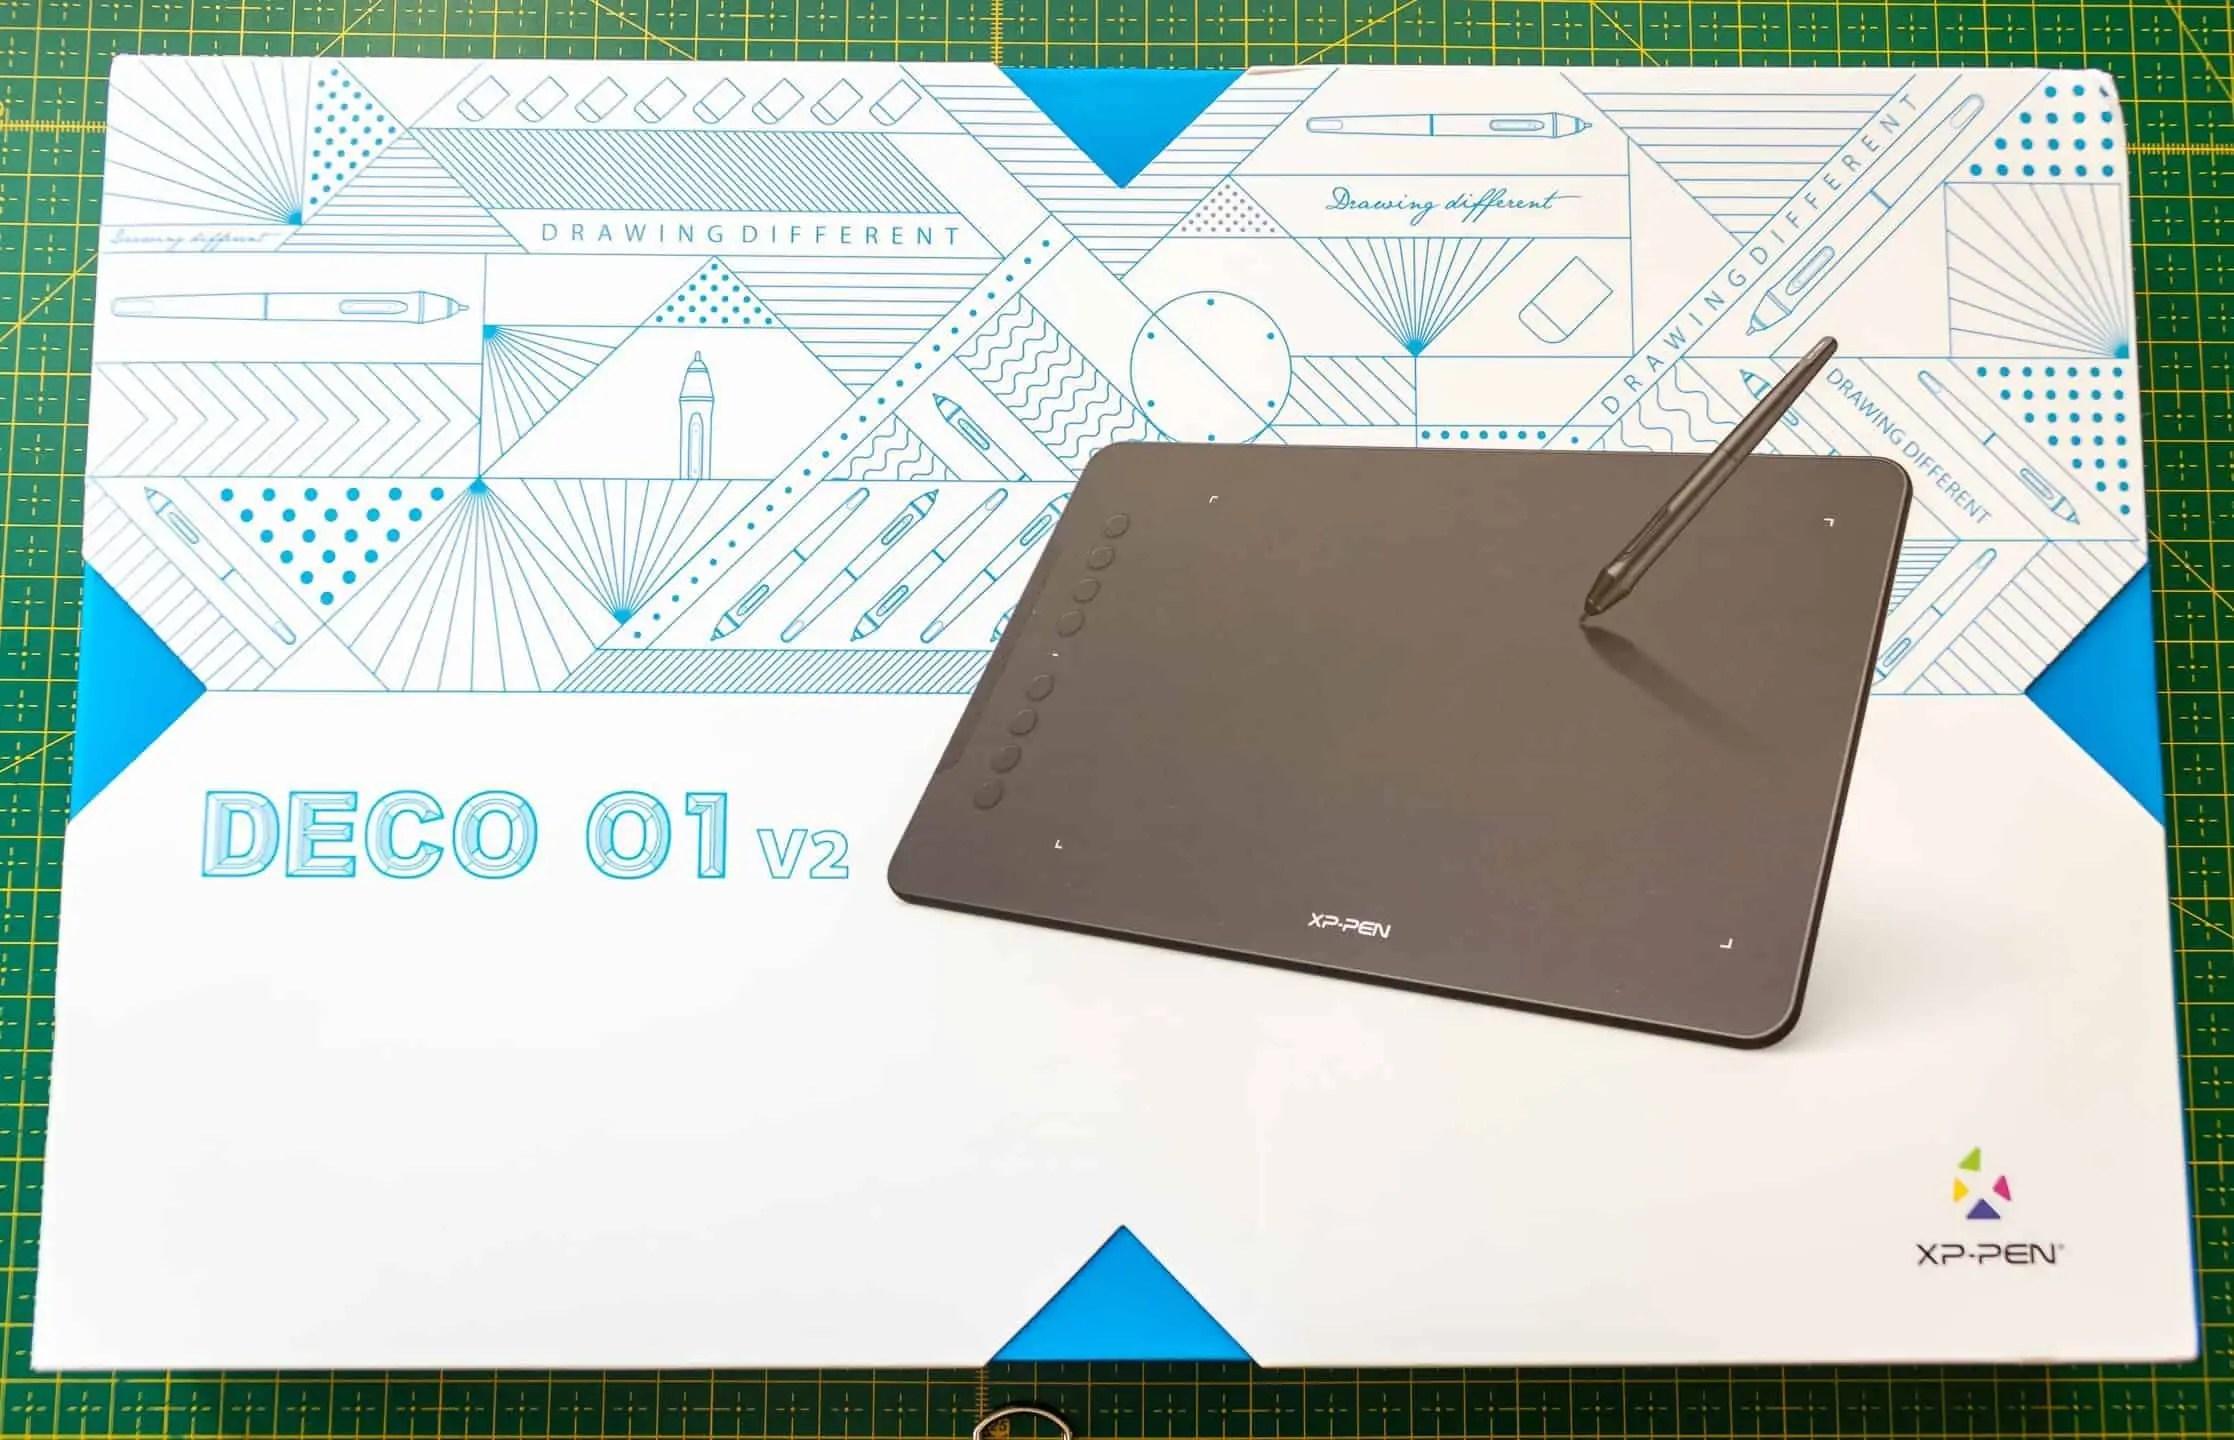 Tablet xppen deco 01 opakowanie - Praca z tabletem graficznym XP PEN Deco 01 v2